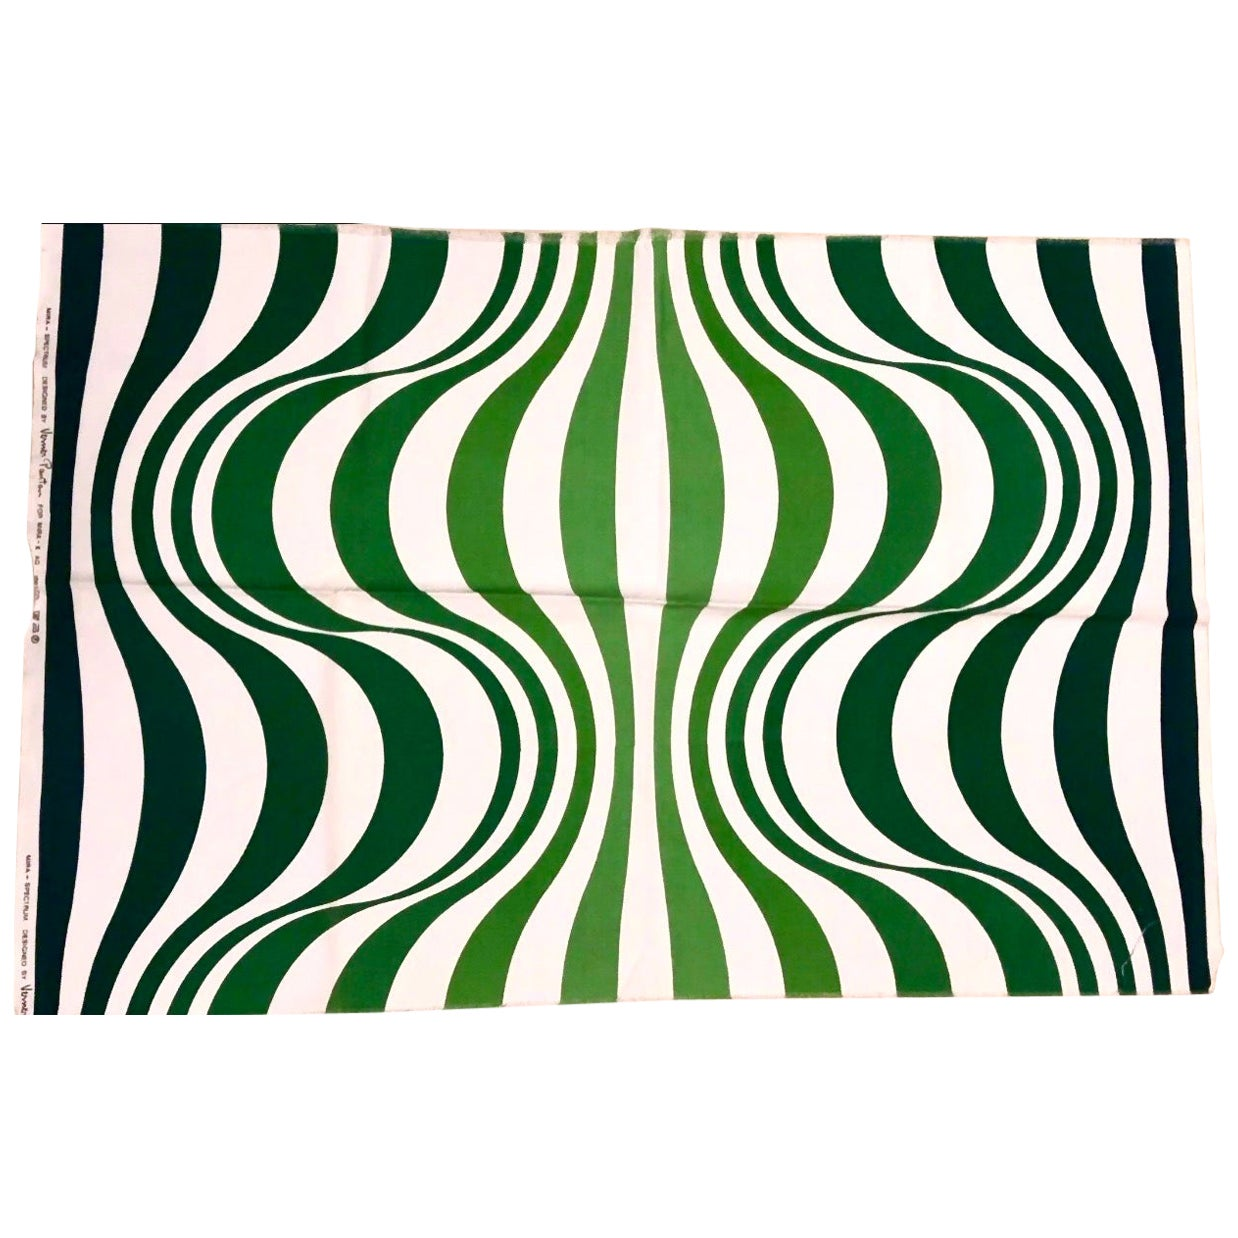 Verner Panton Green Spectrum for Mira X Handprinted Textile Panel, Rare, 1960s